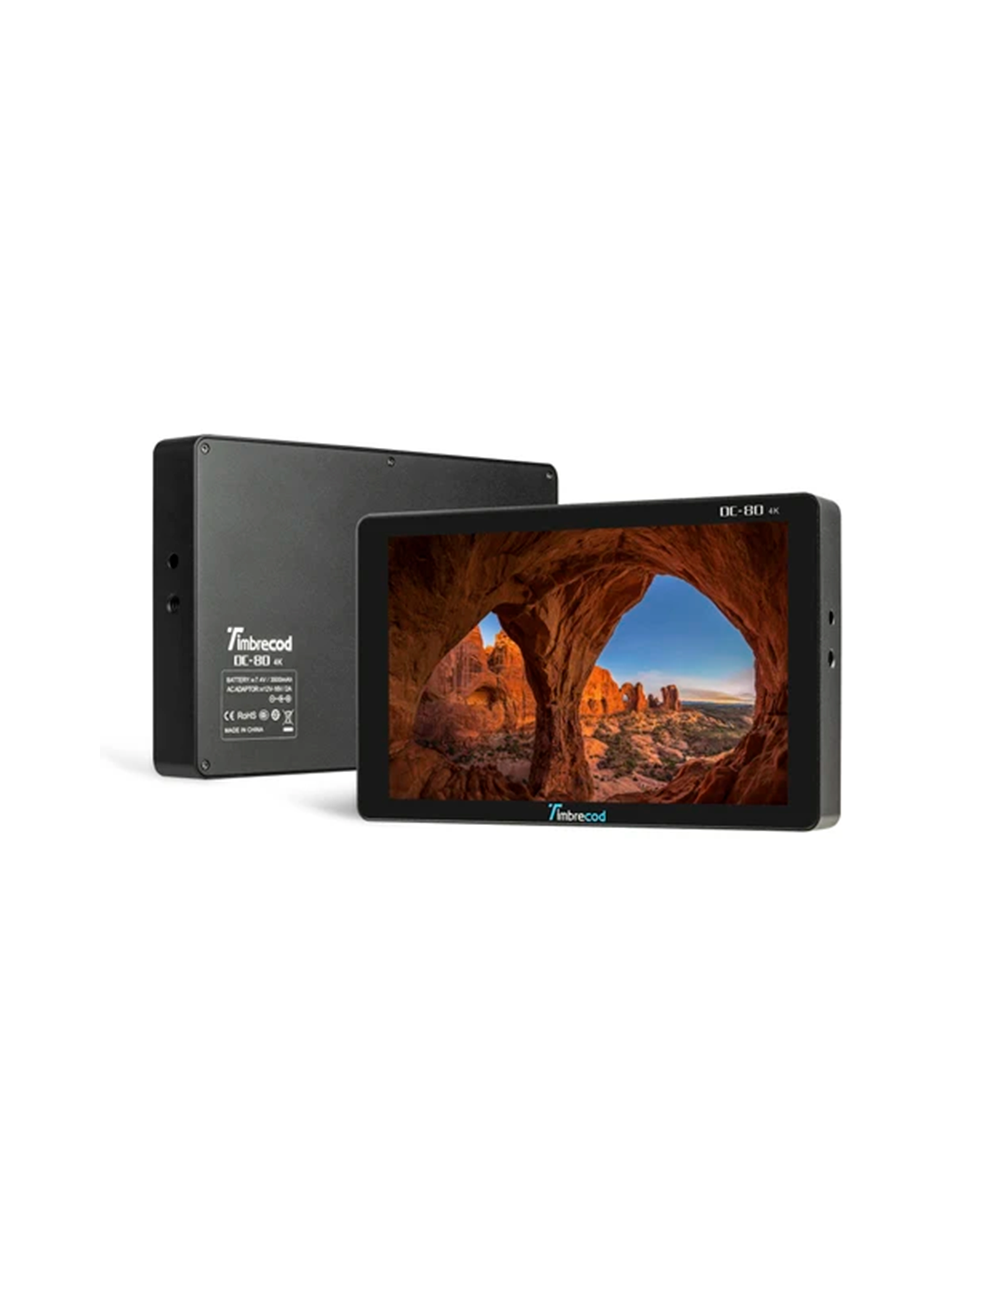 Lente Tamron AF 70-300mm 4 - 5,6 Di VC USD Para Nikon